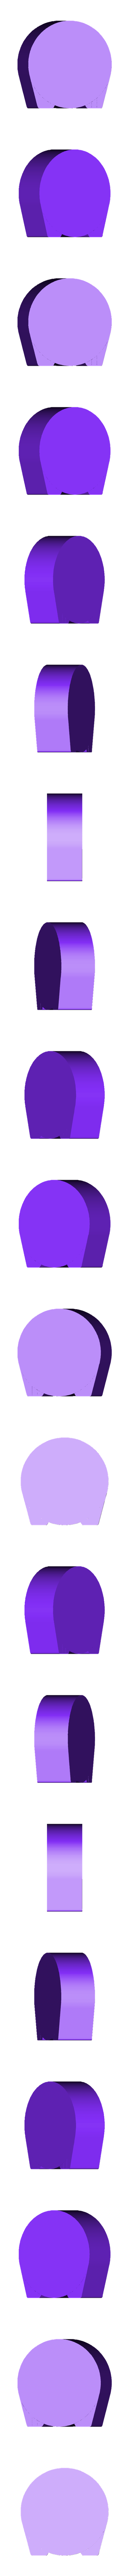 Whitegas_74mm_Canister_Feet.stl Download free STL file Liquid Fuel Bottle Feet • Template to 3D print, WalterHsiao